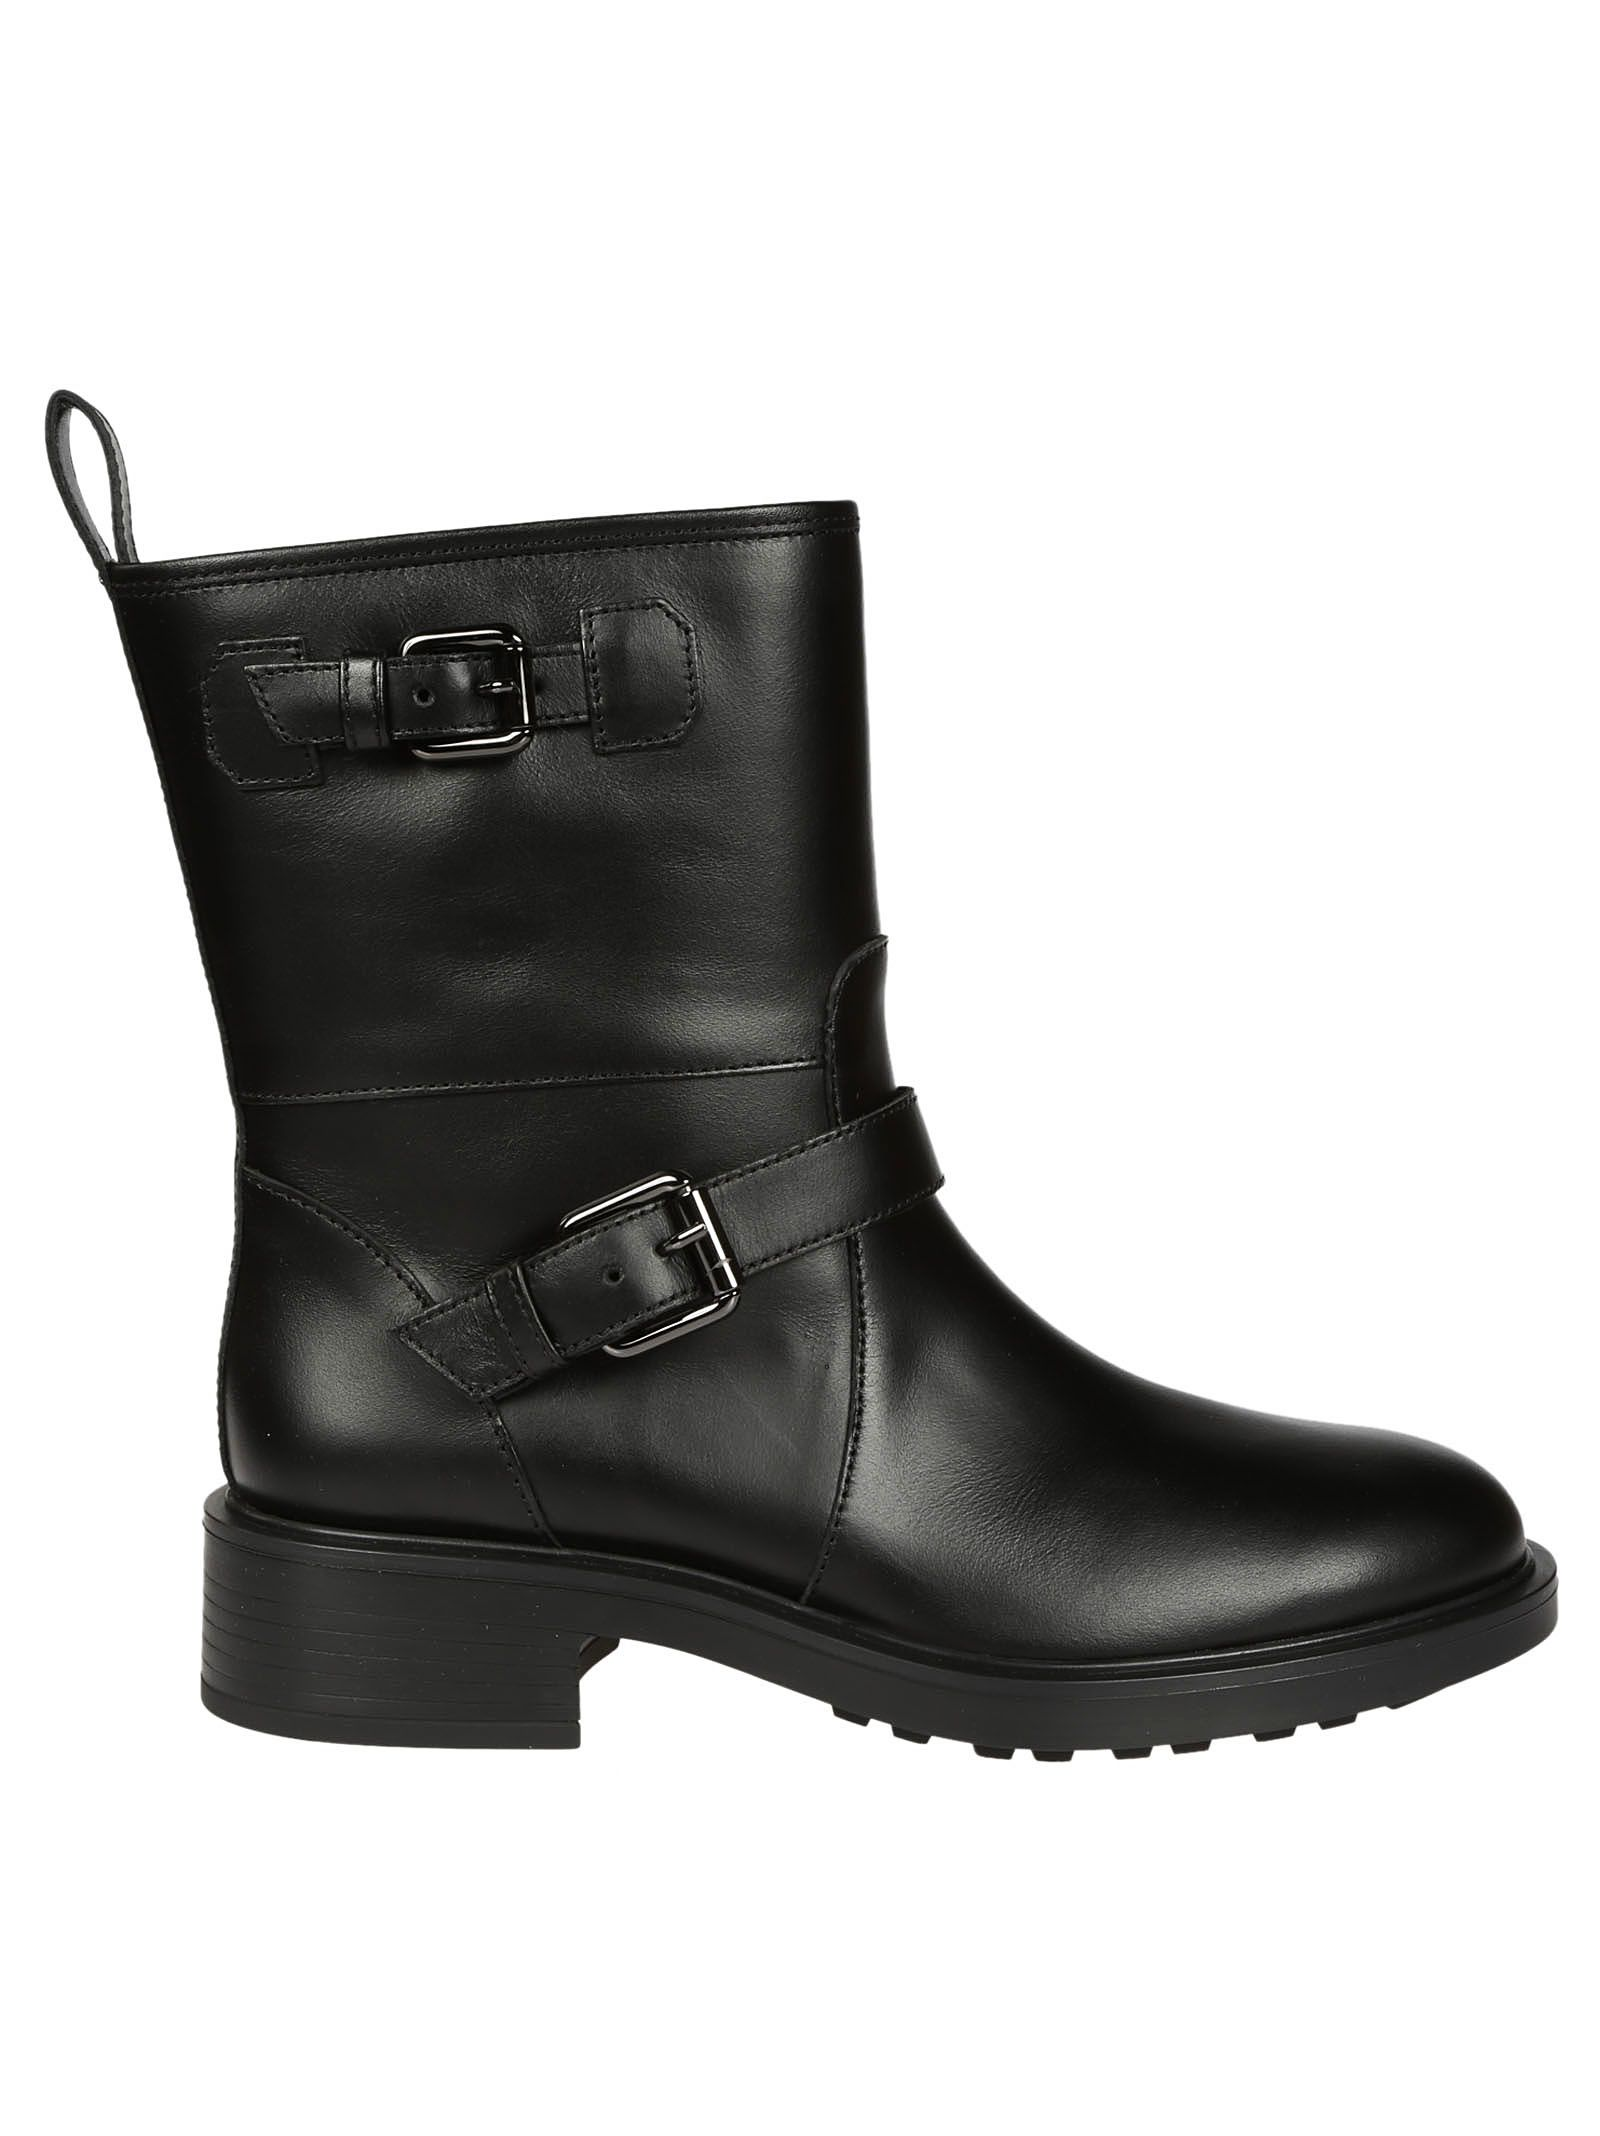 Hogan H332 Boots